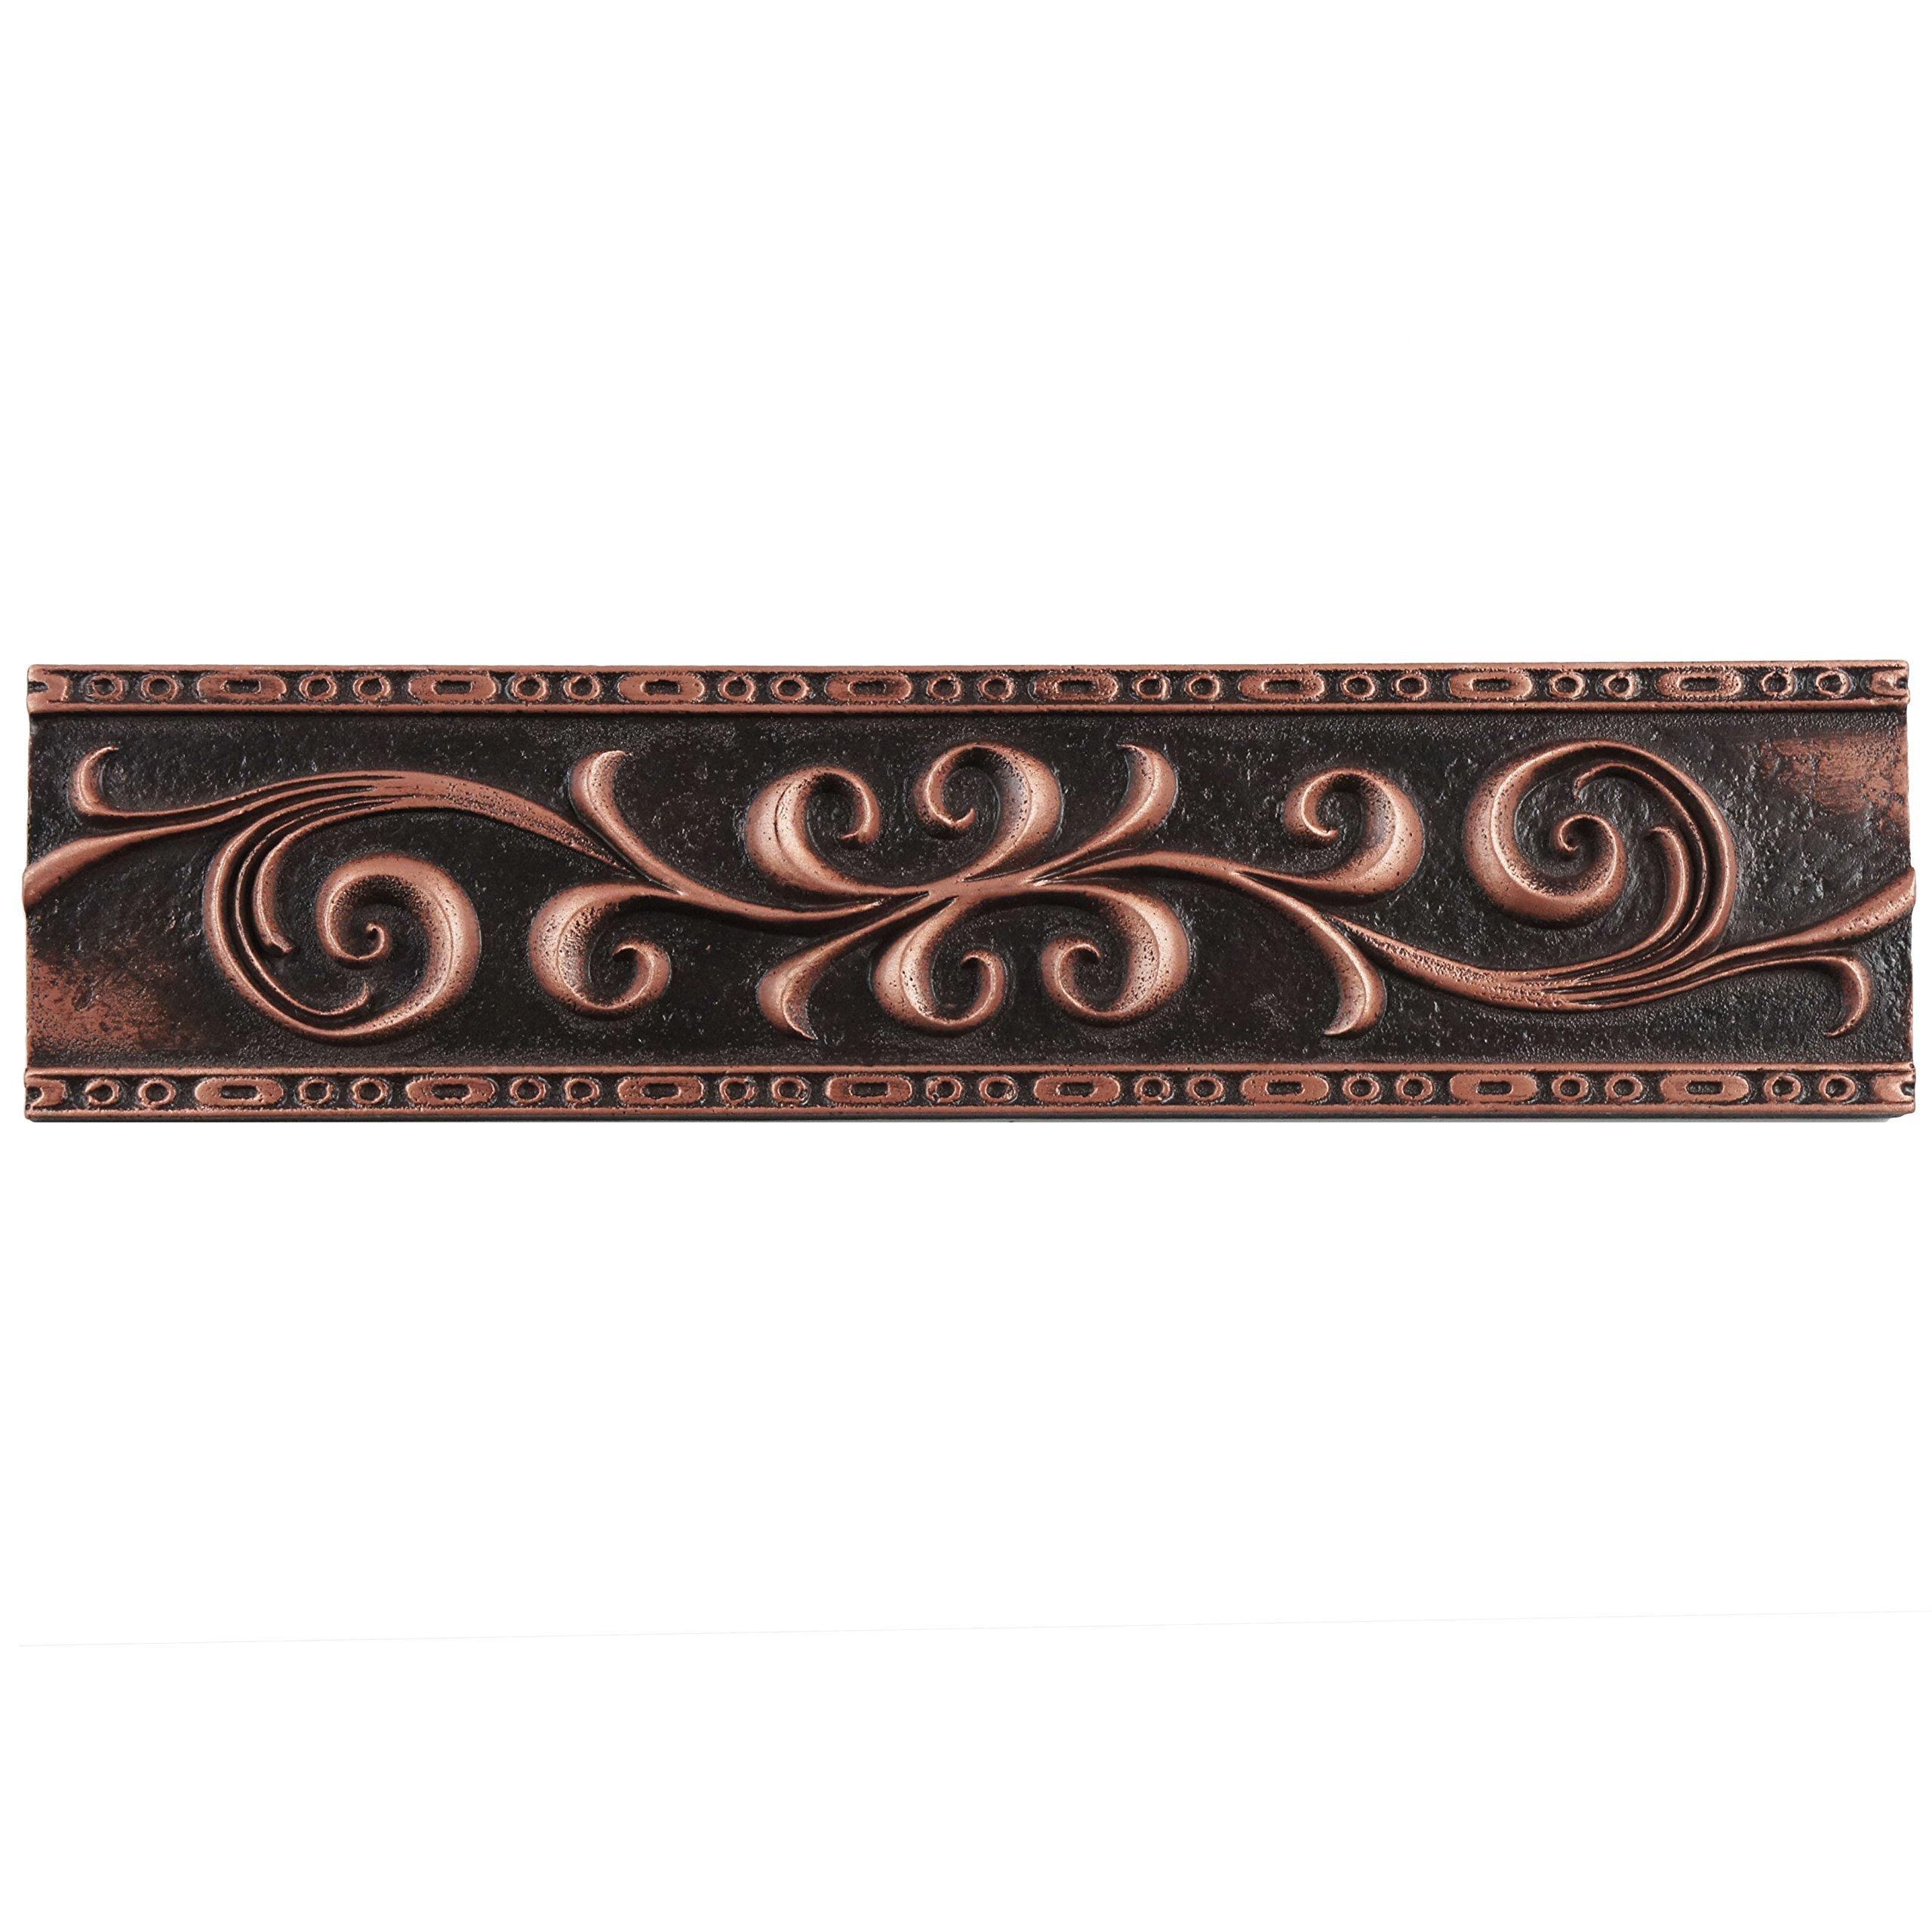 SomerTile WGMSVBRL Denbora Scroll Metallic Liner Wall Trim Tile, 3'' x 12'', Bronze